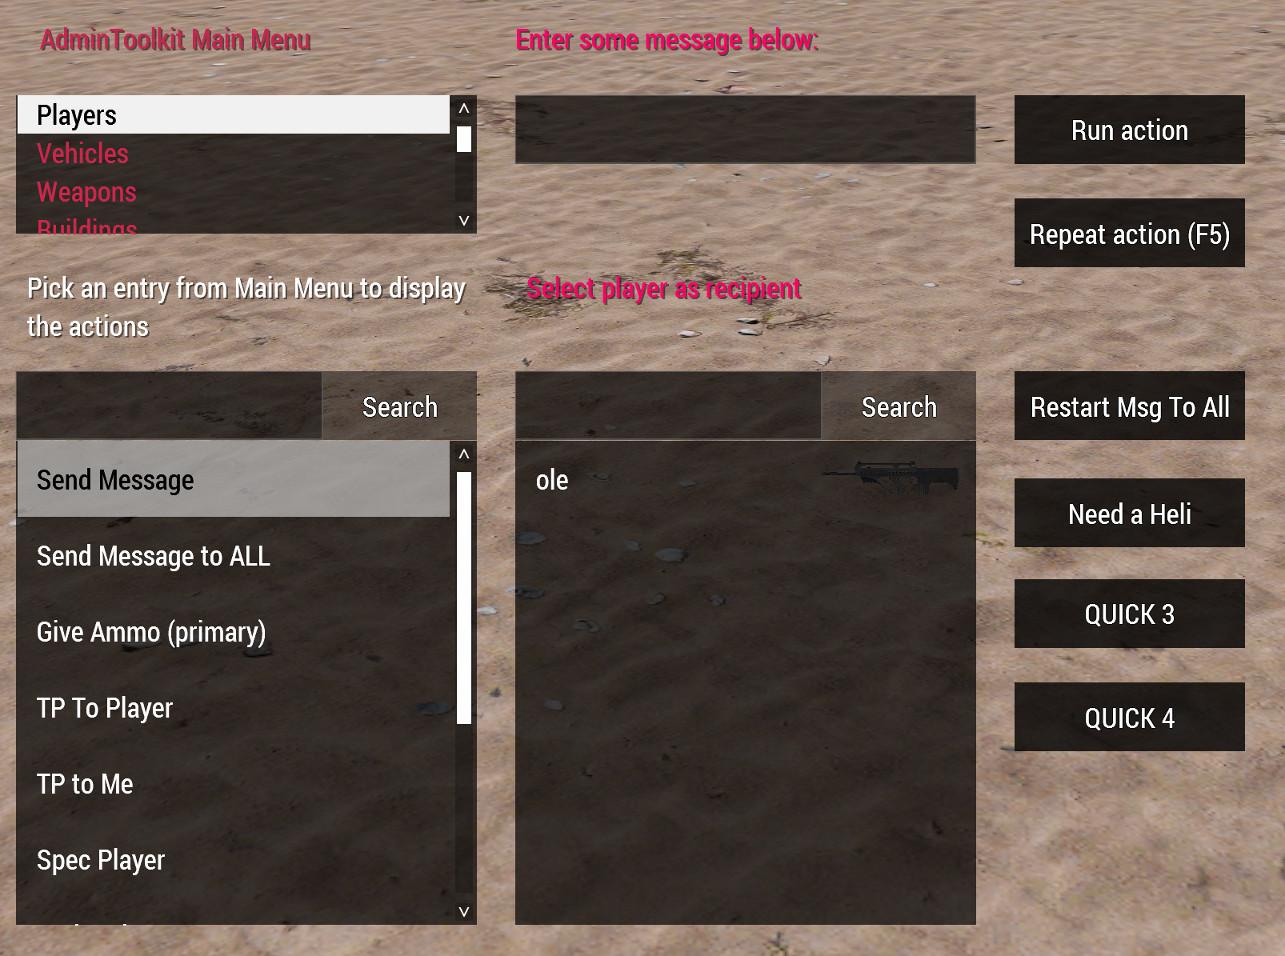 a3-atk-players.jpg